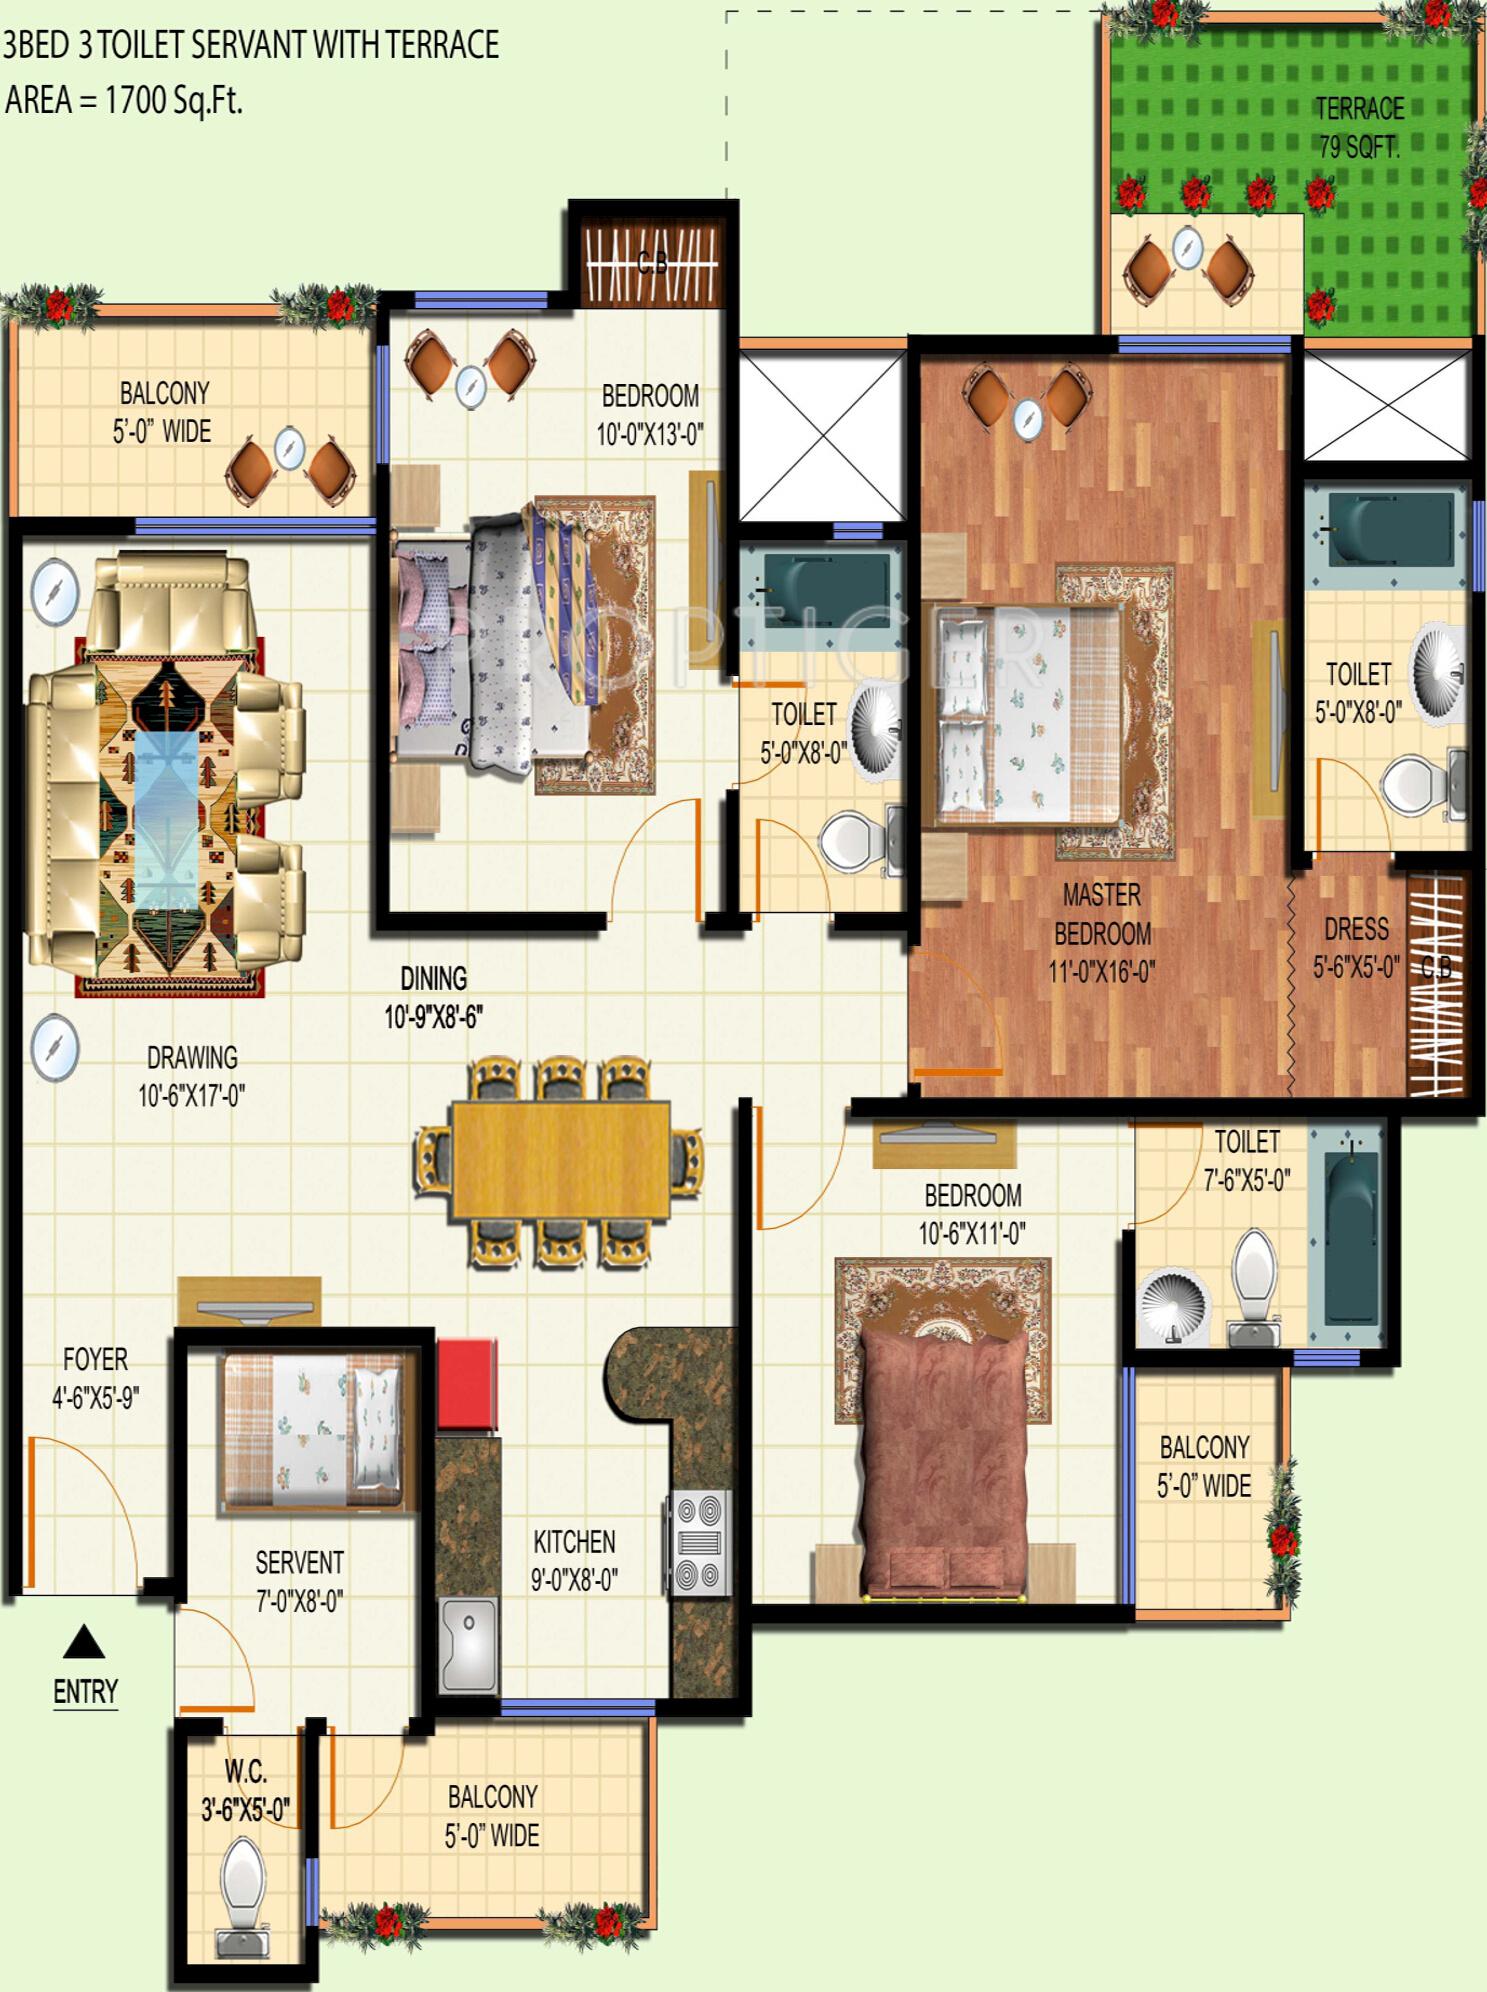 100 540 Sq Ft Floor Plan Craftsman House Designs